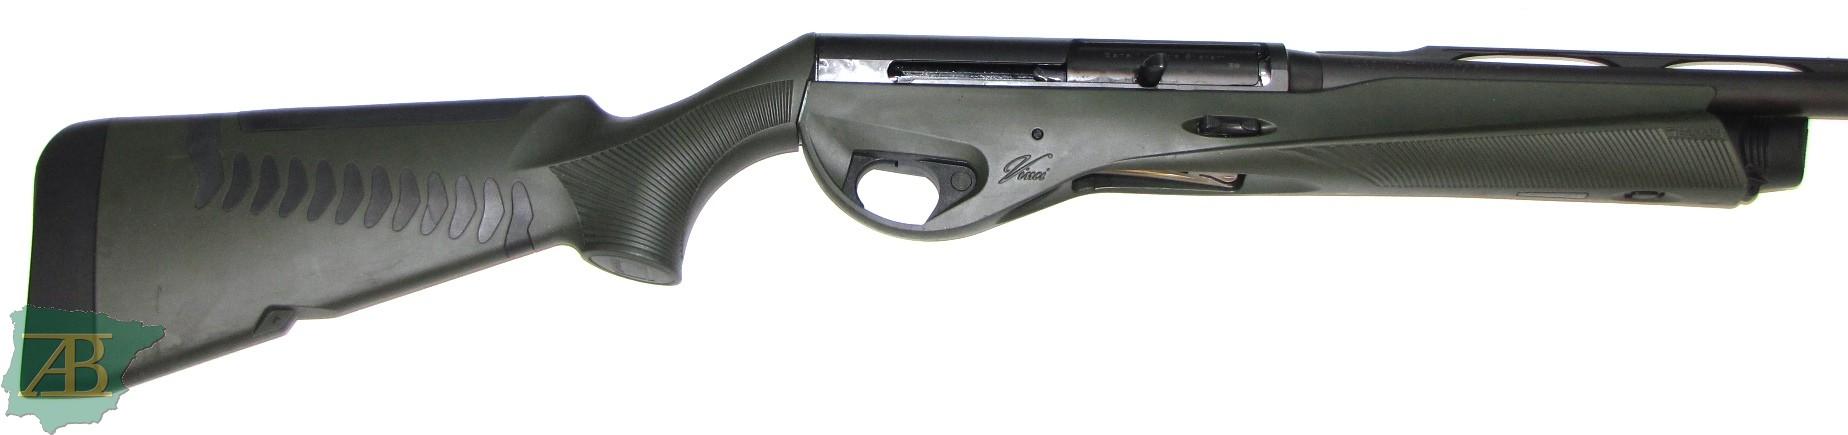 Escopeta semiautomática de caza BENELLI VINCI Ref 5858-armeriaiberica-2